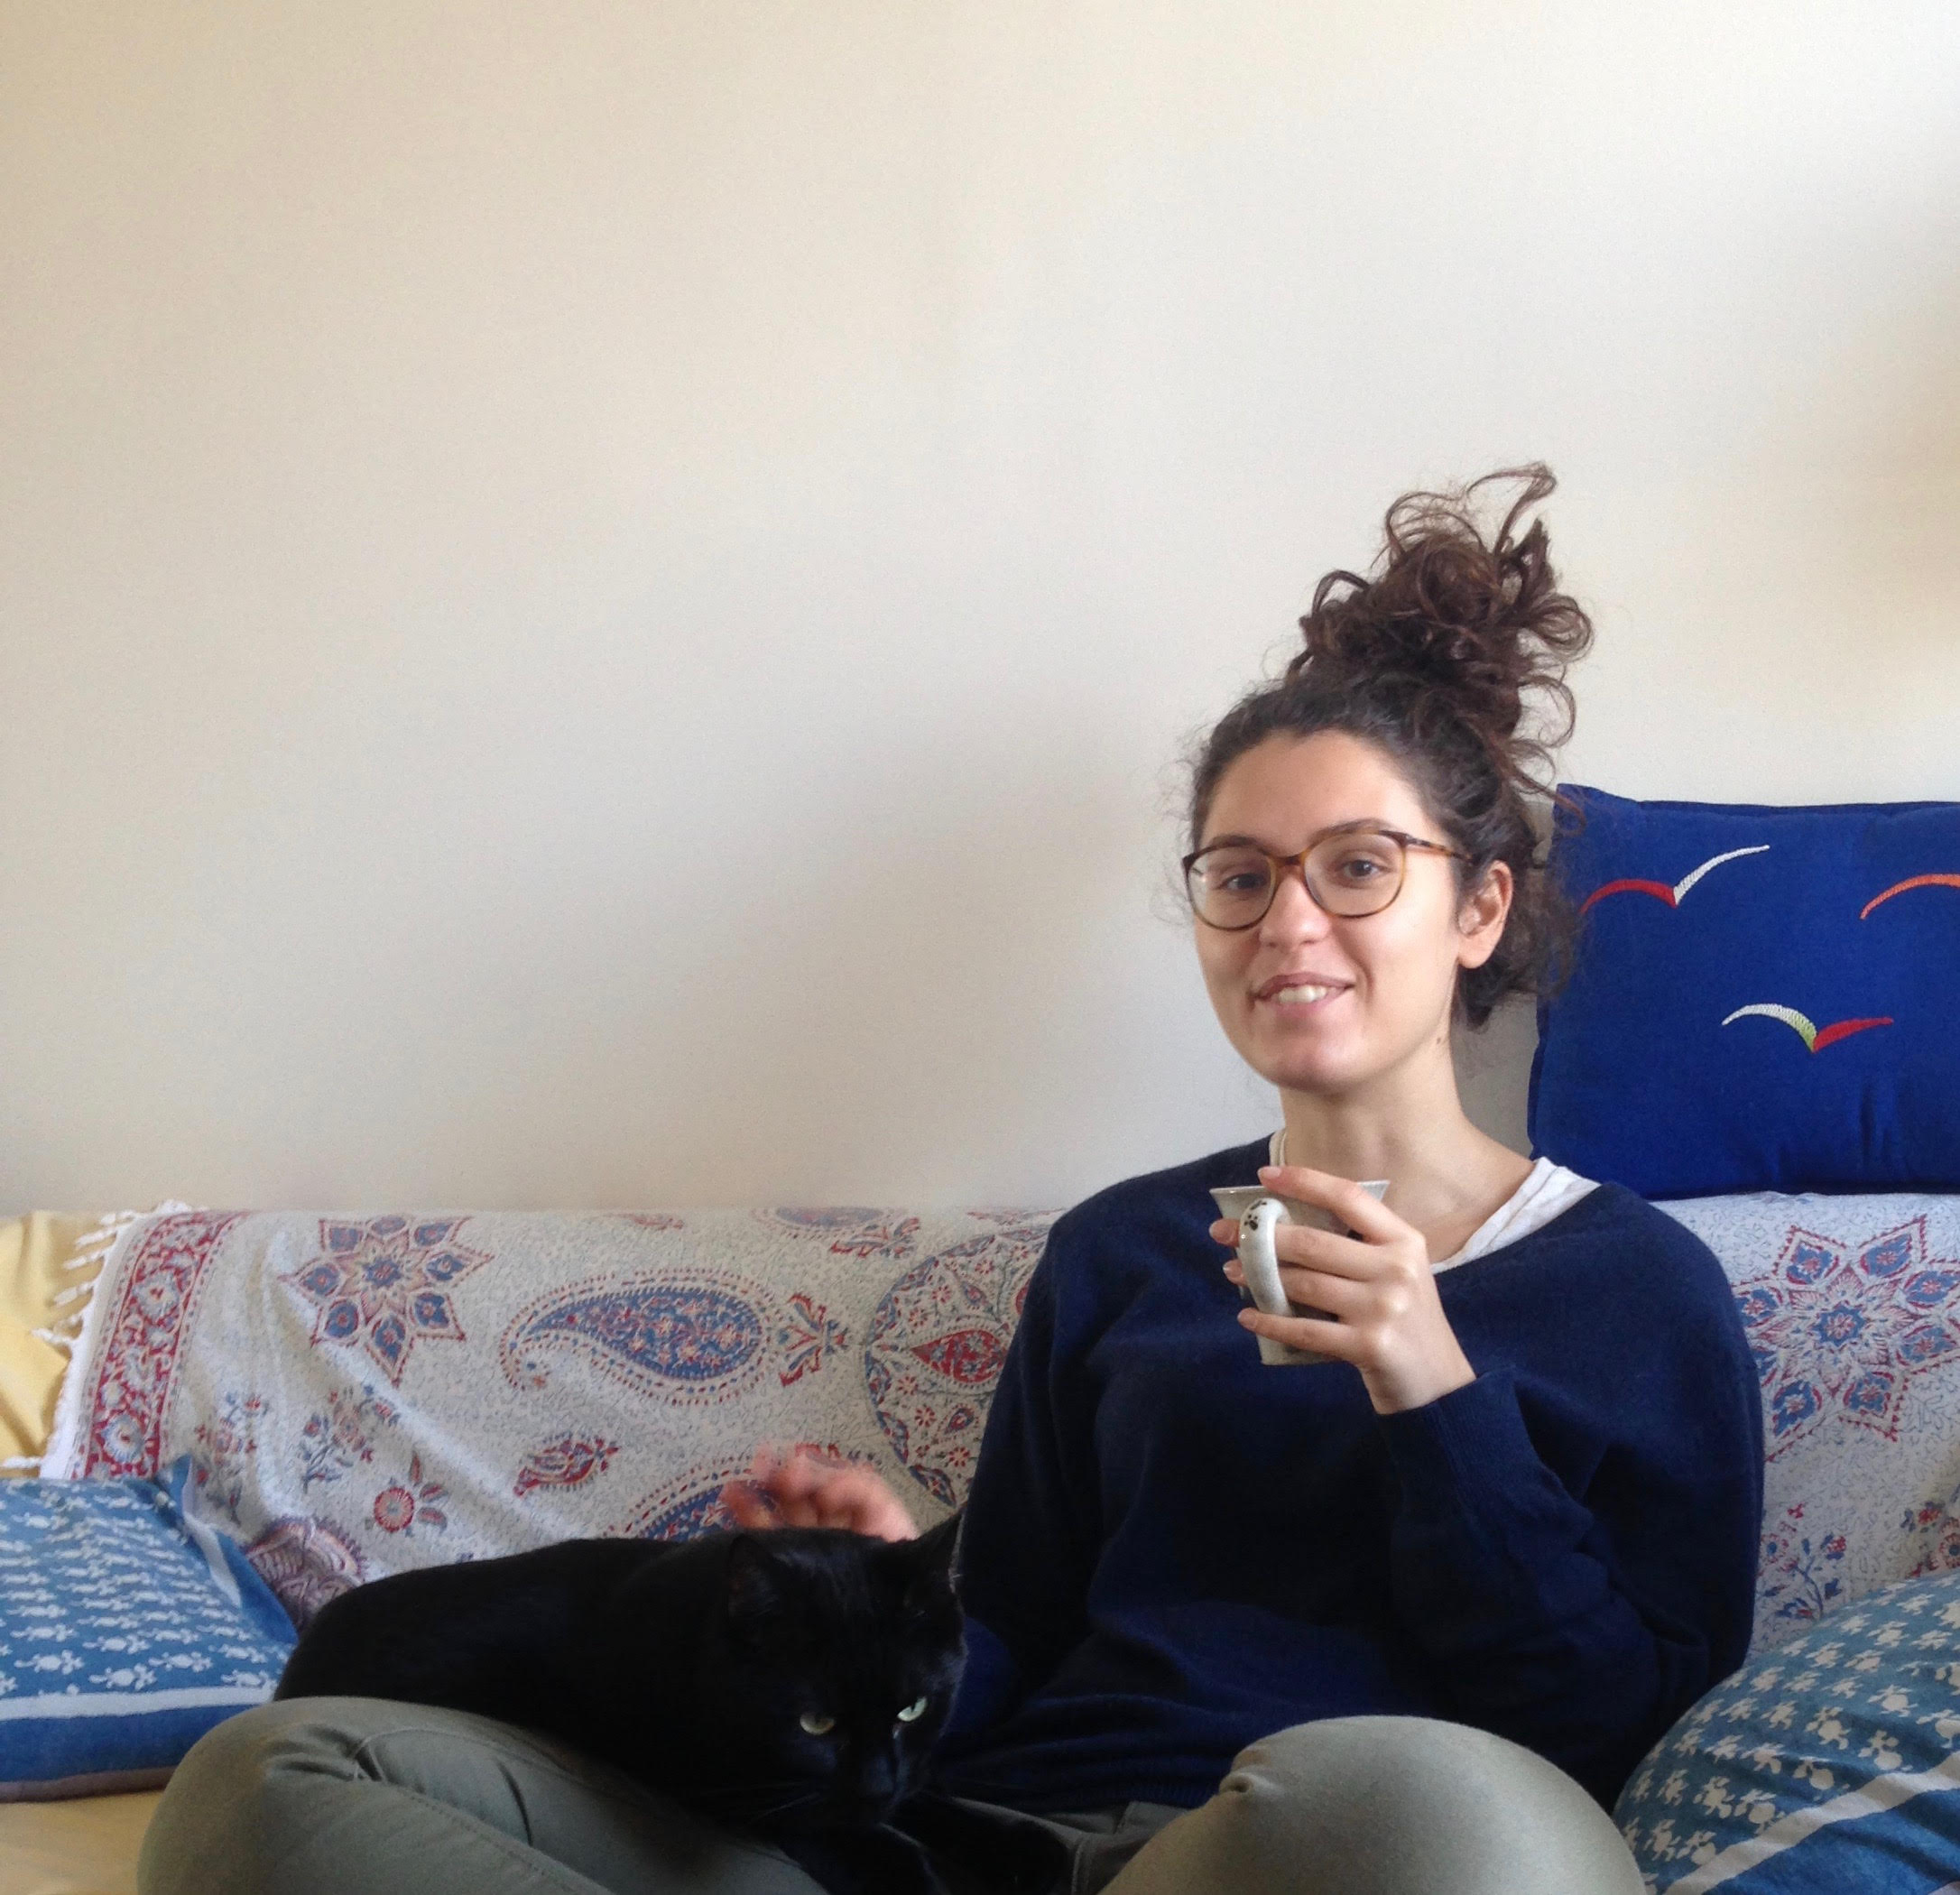 Marine Bouaziz - Personal Picture.jpg